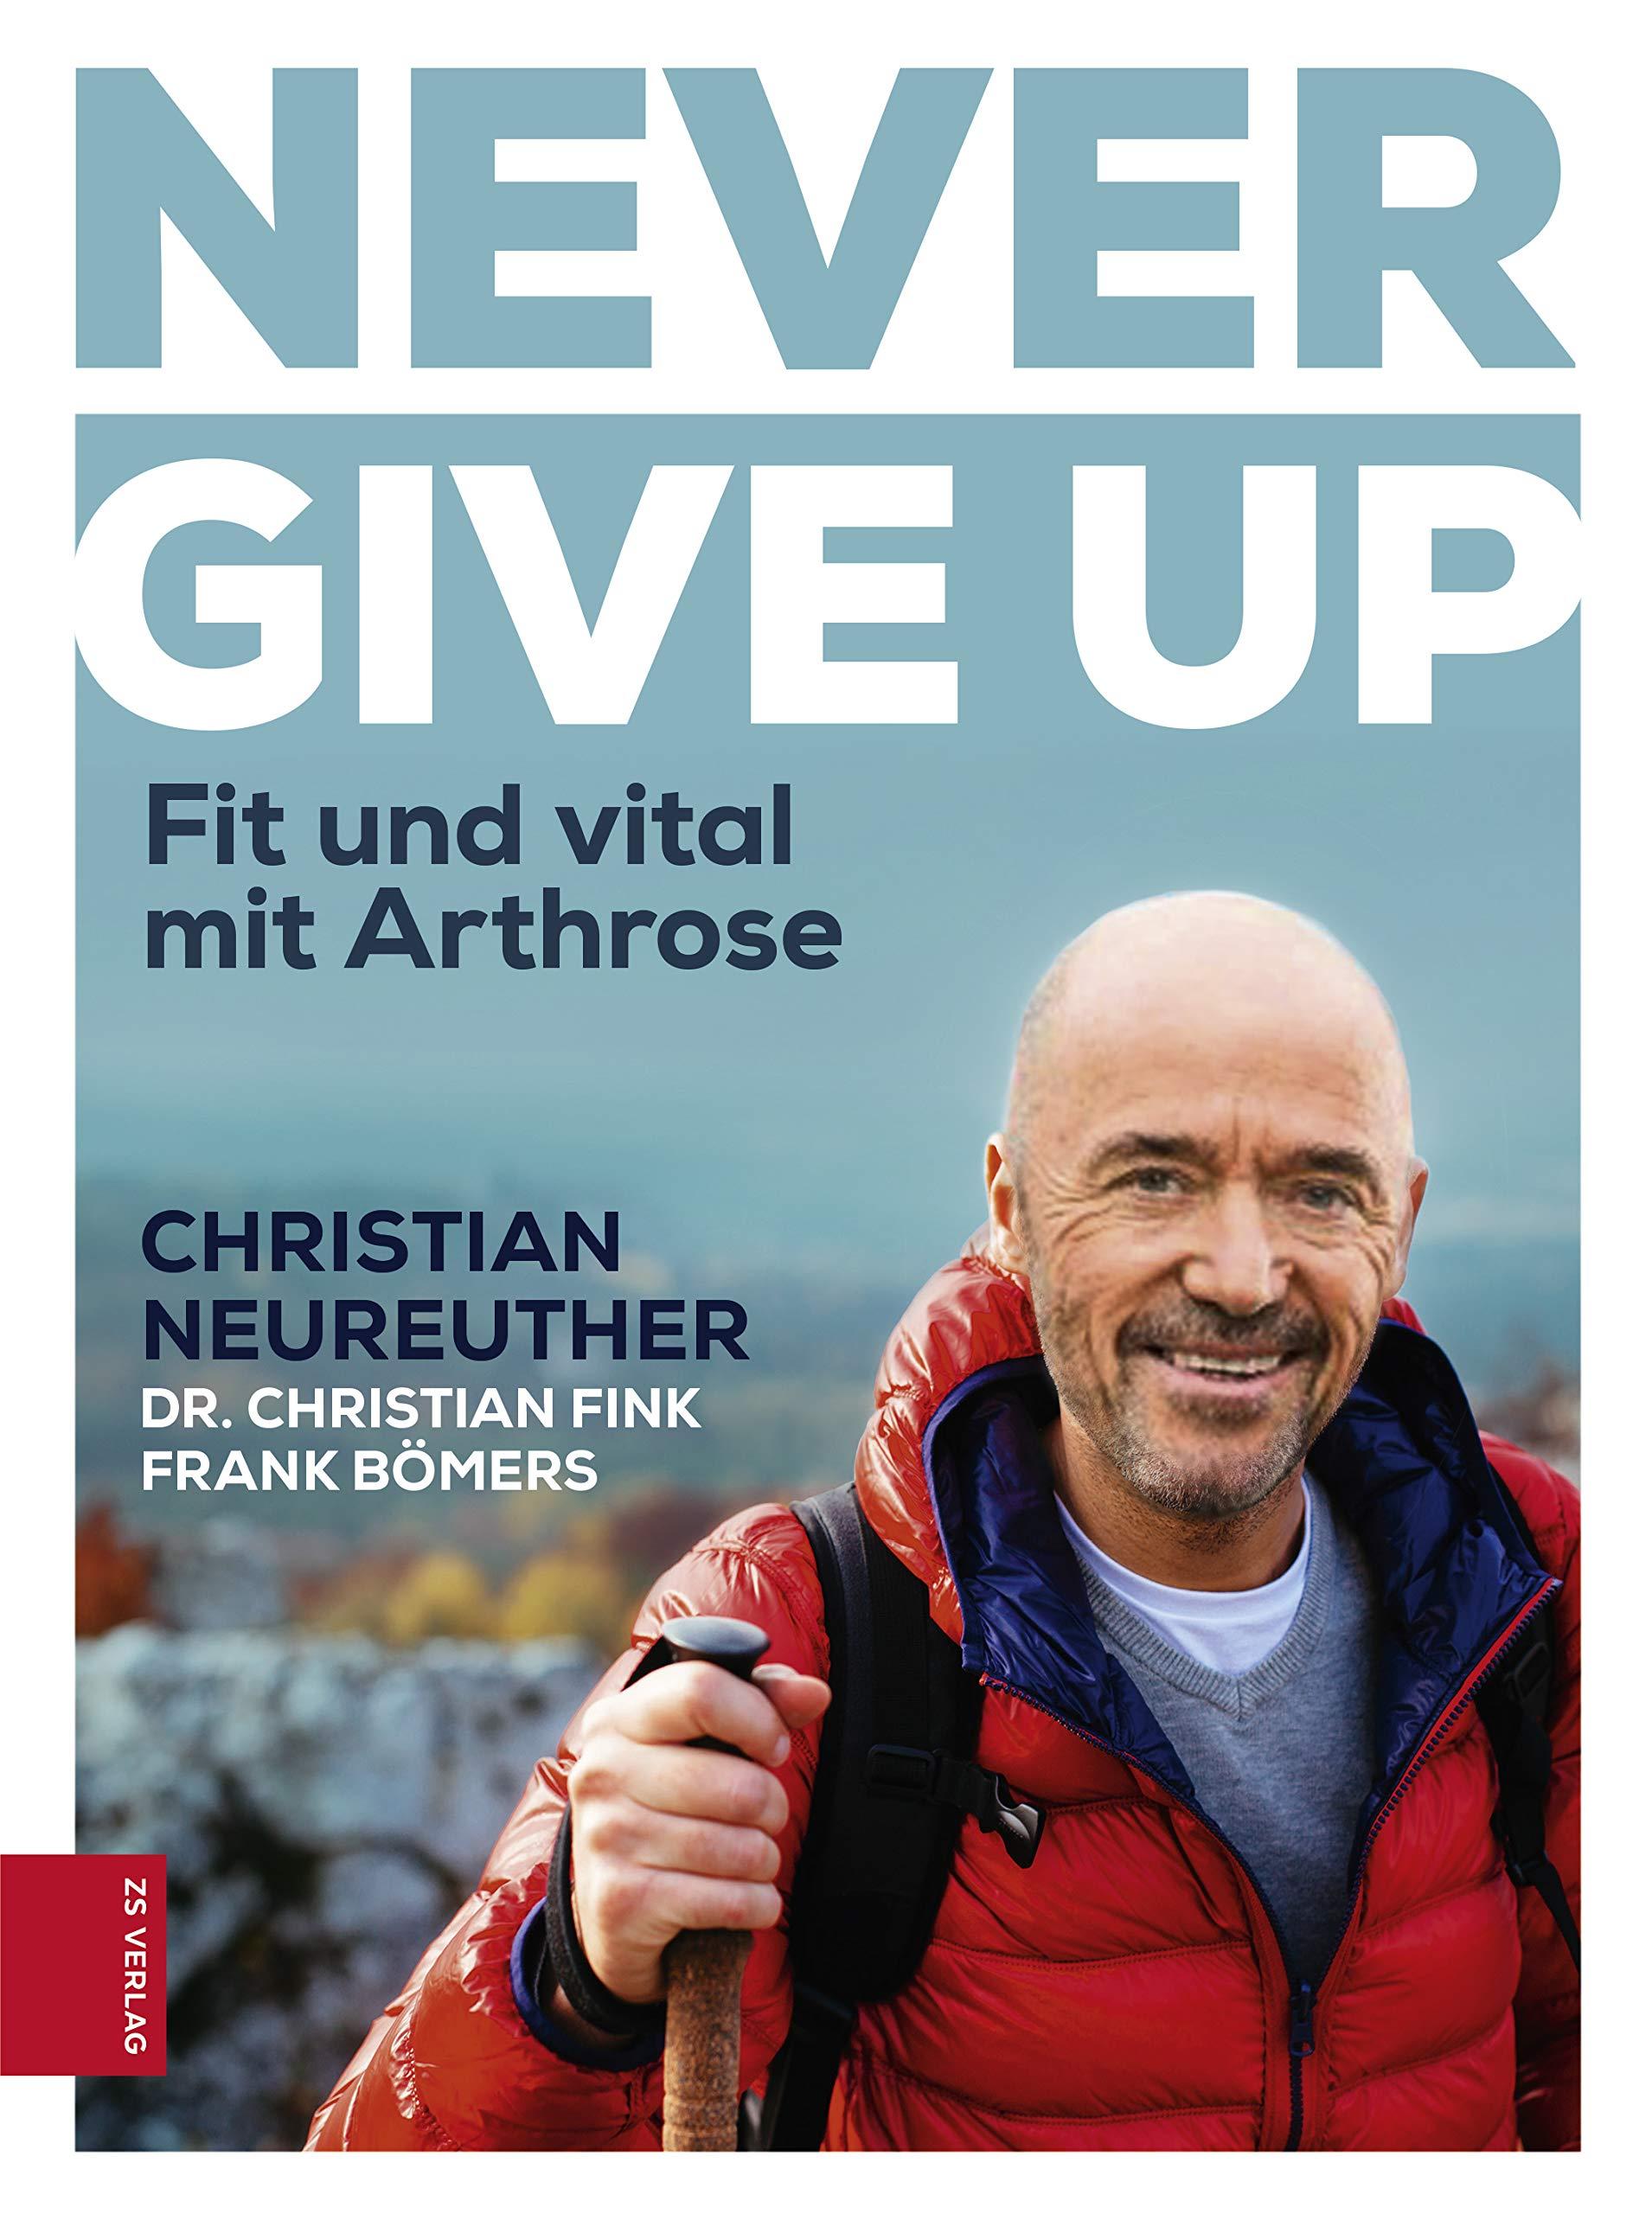 Never give up: Fit und vital mit Arthrose